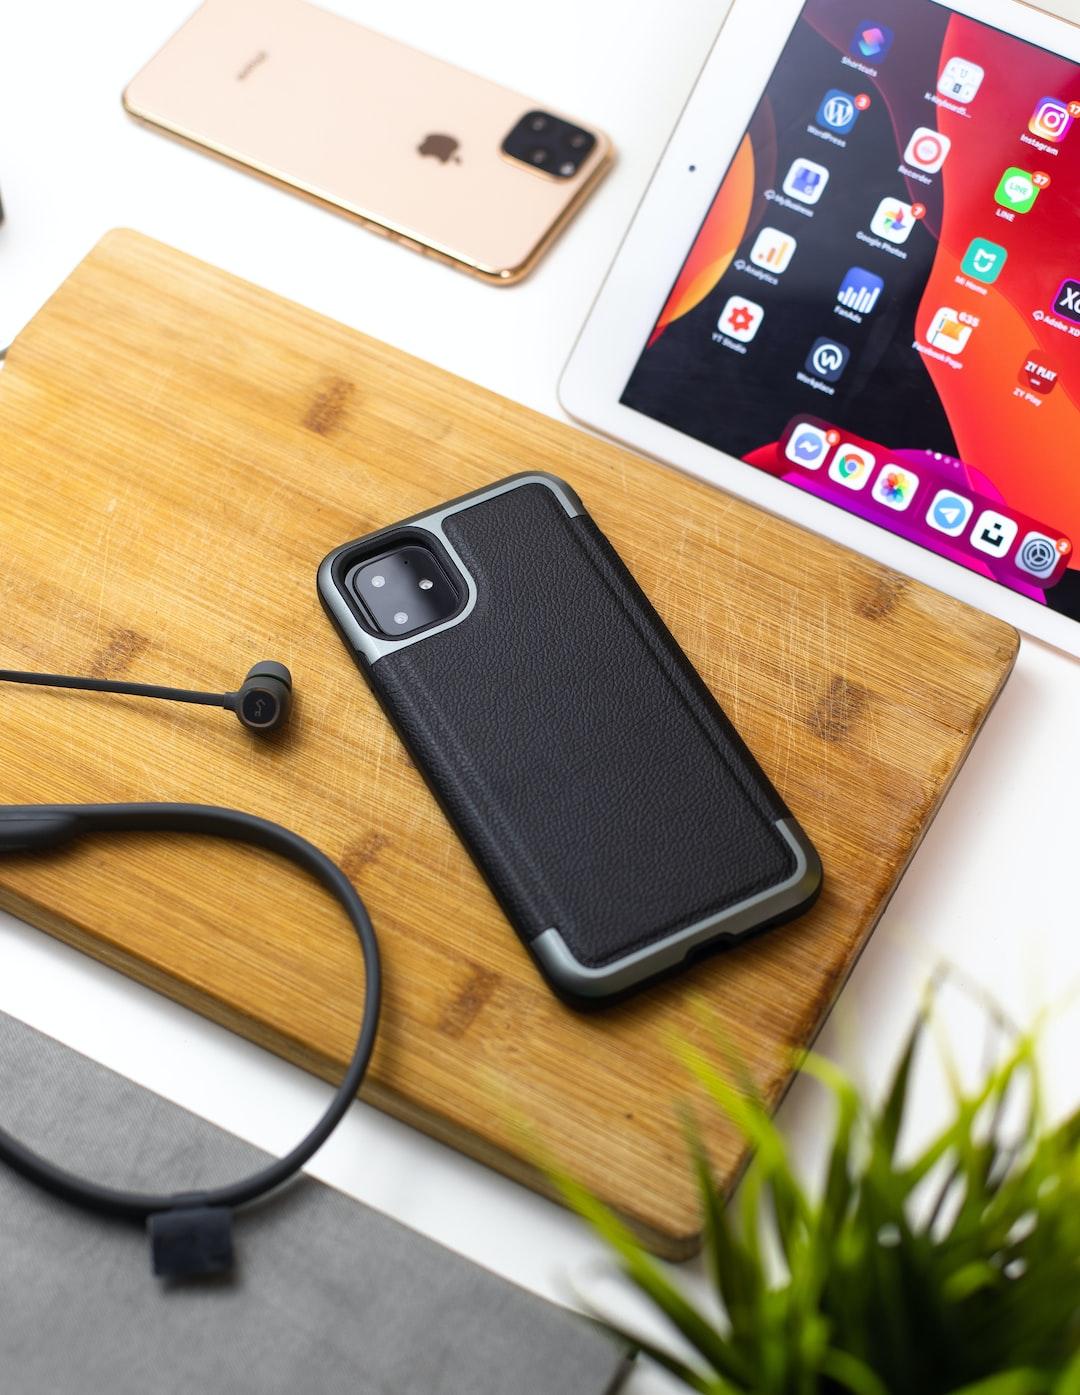 Iphone 11 and Ipad